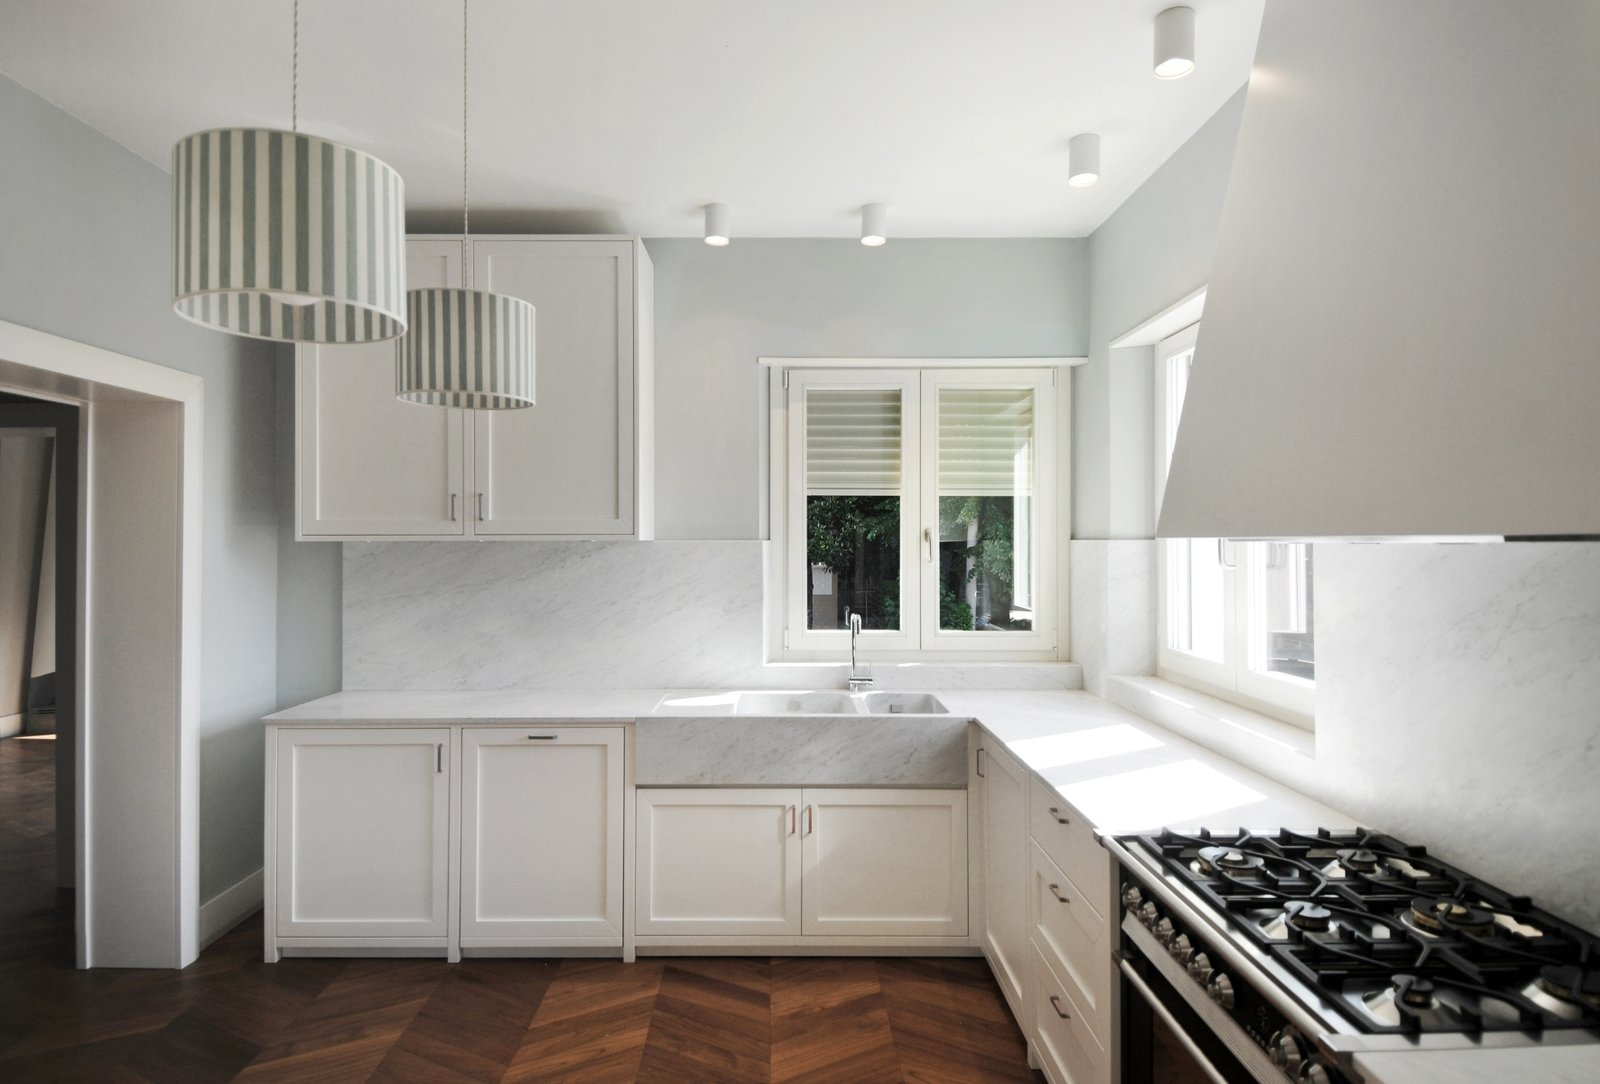 Kitchen, White Cabinet, Medium Hardwood Floor, Marble Backsplashe, Marble Counter, Ceiling Lighting, Drop In Sink, Dishwasher, and Refrigerator buda_kitchen  Best Photos from buda